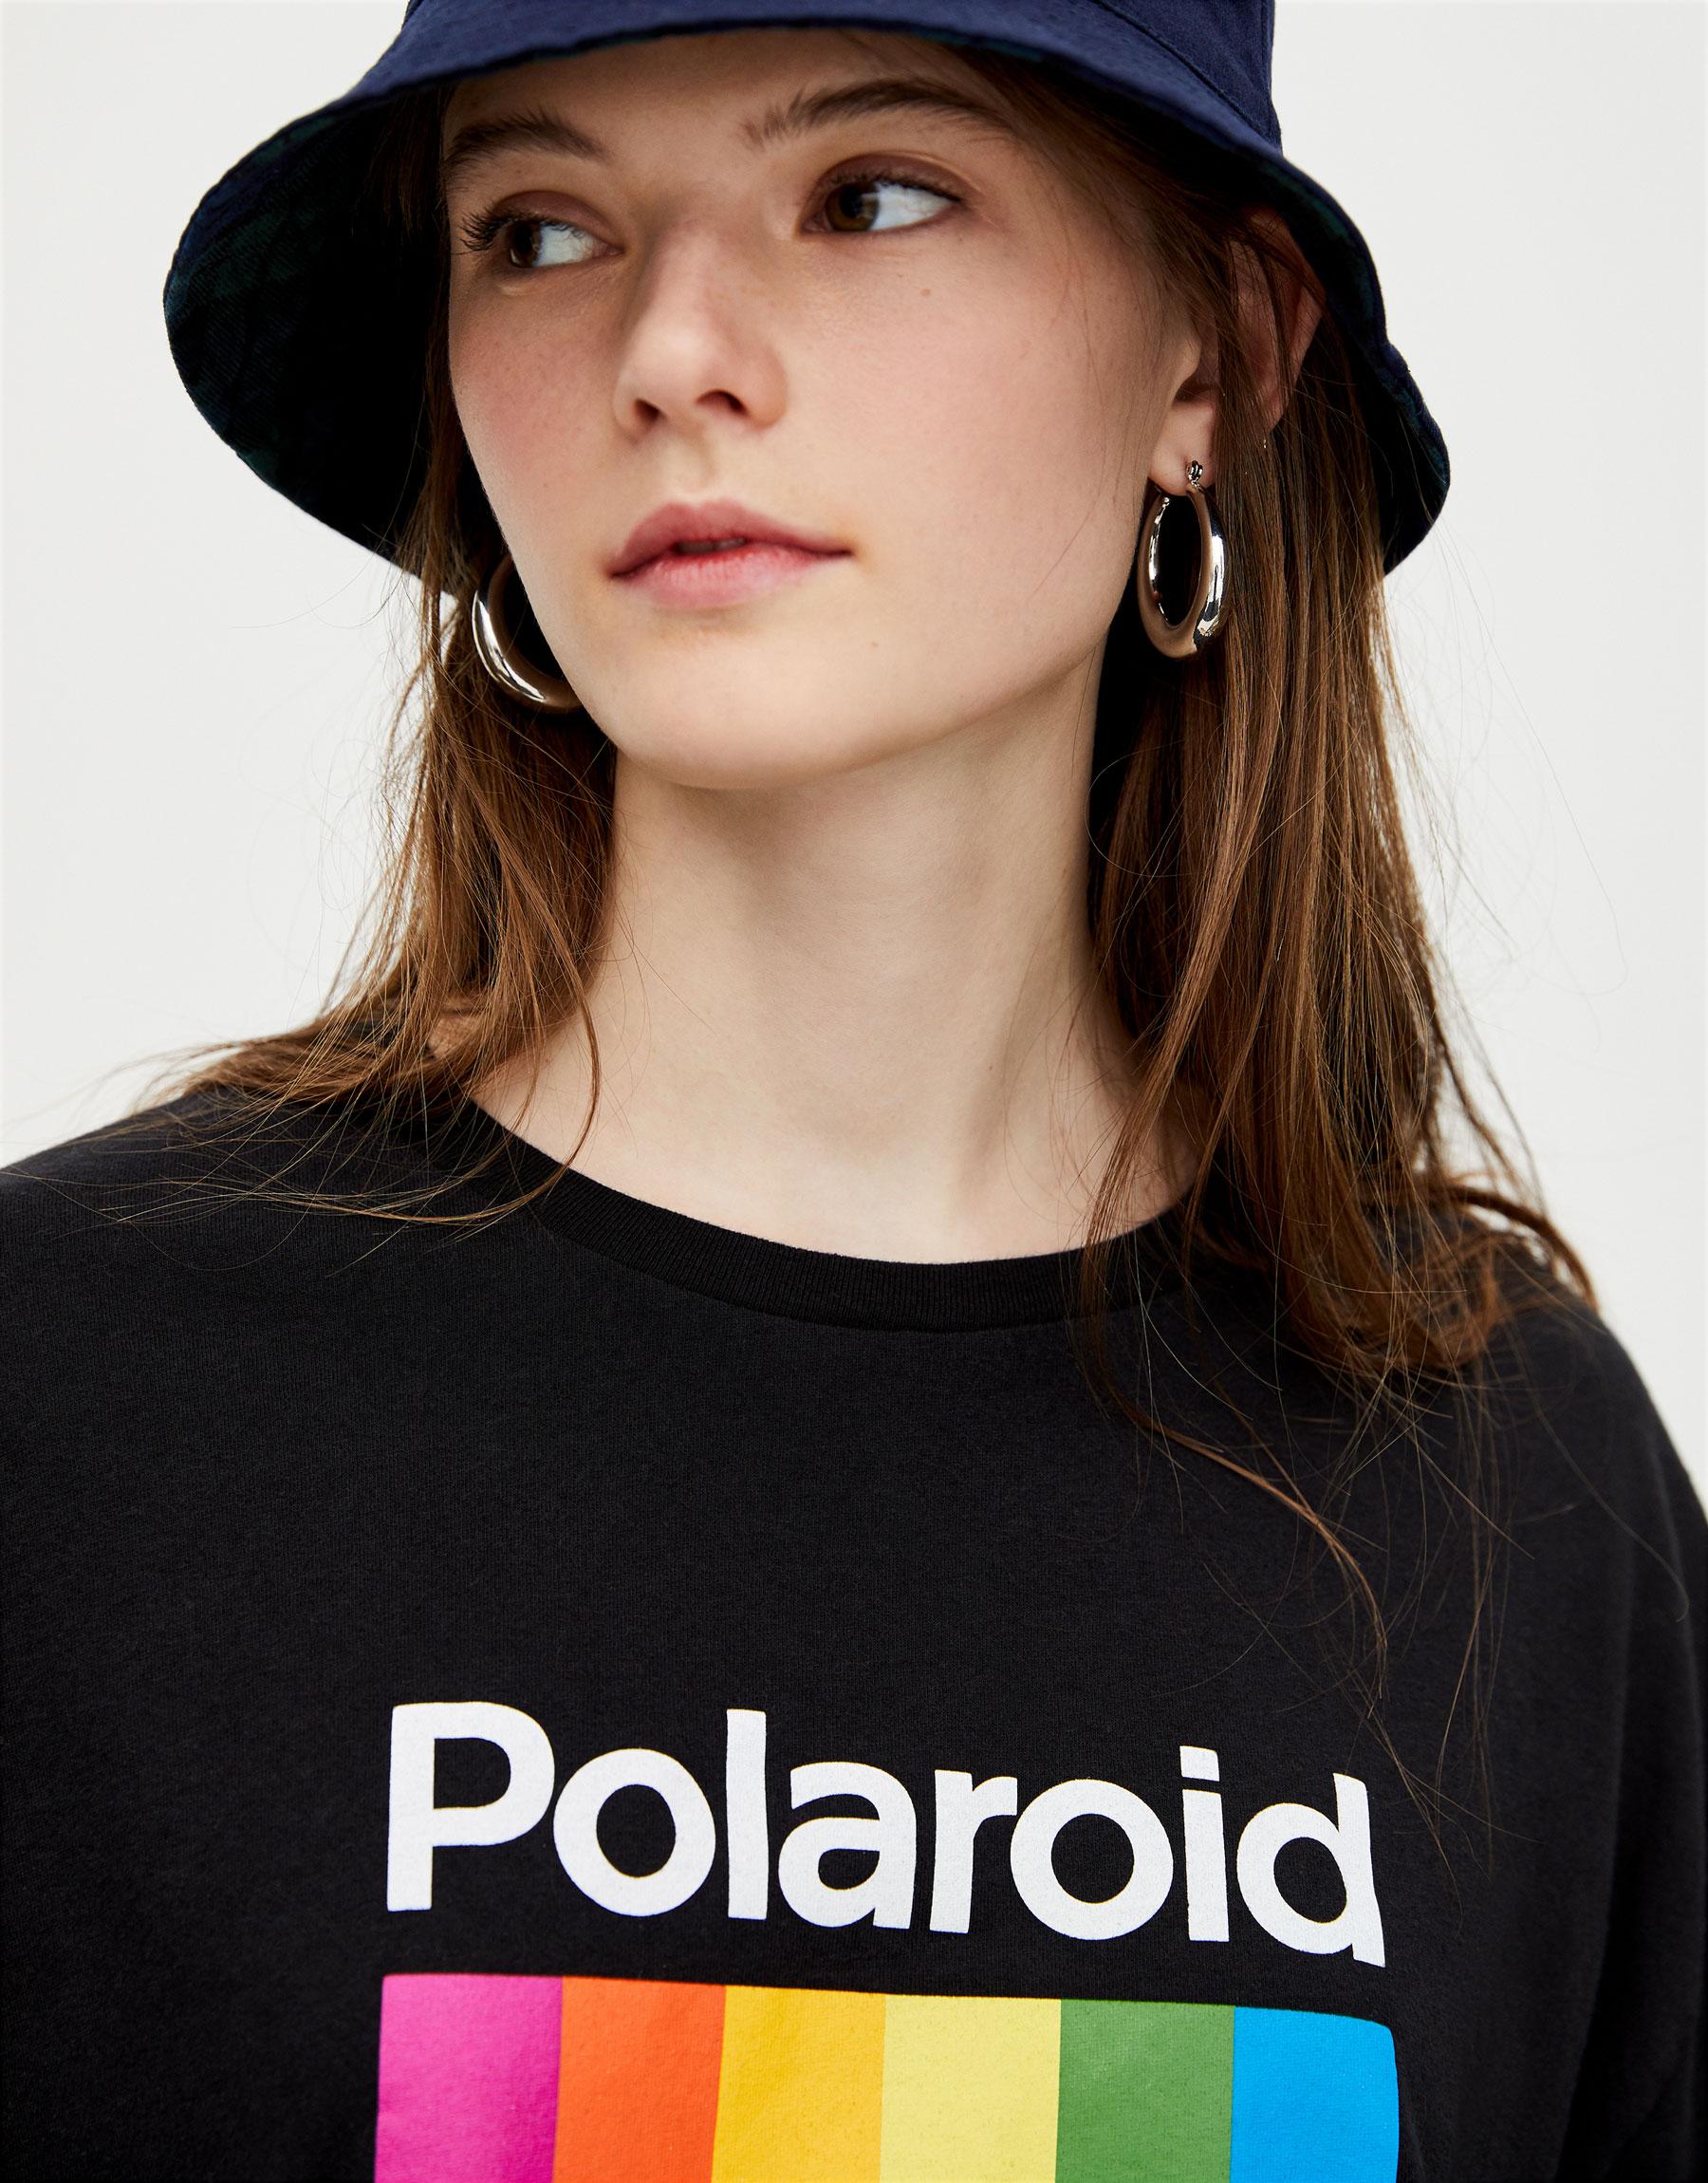 001dbb918 Modalite - Pullbear Polaroid T-shirt with multicolored logo